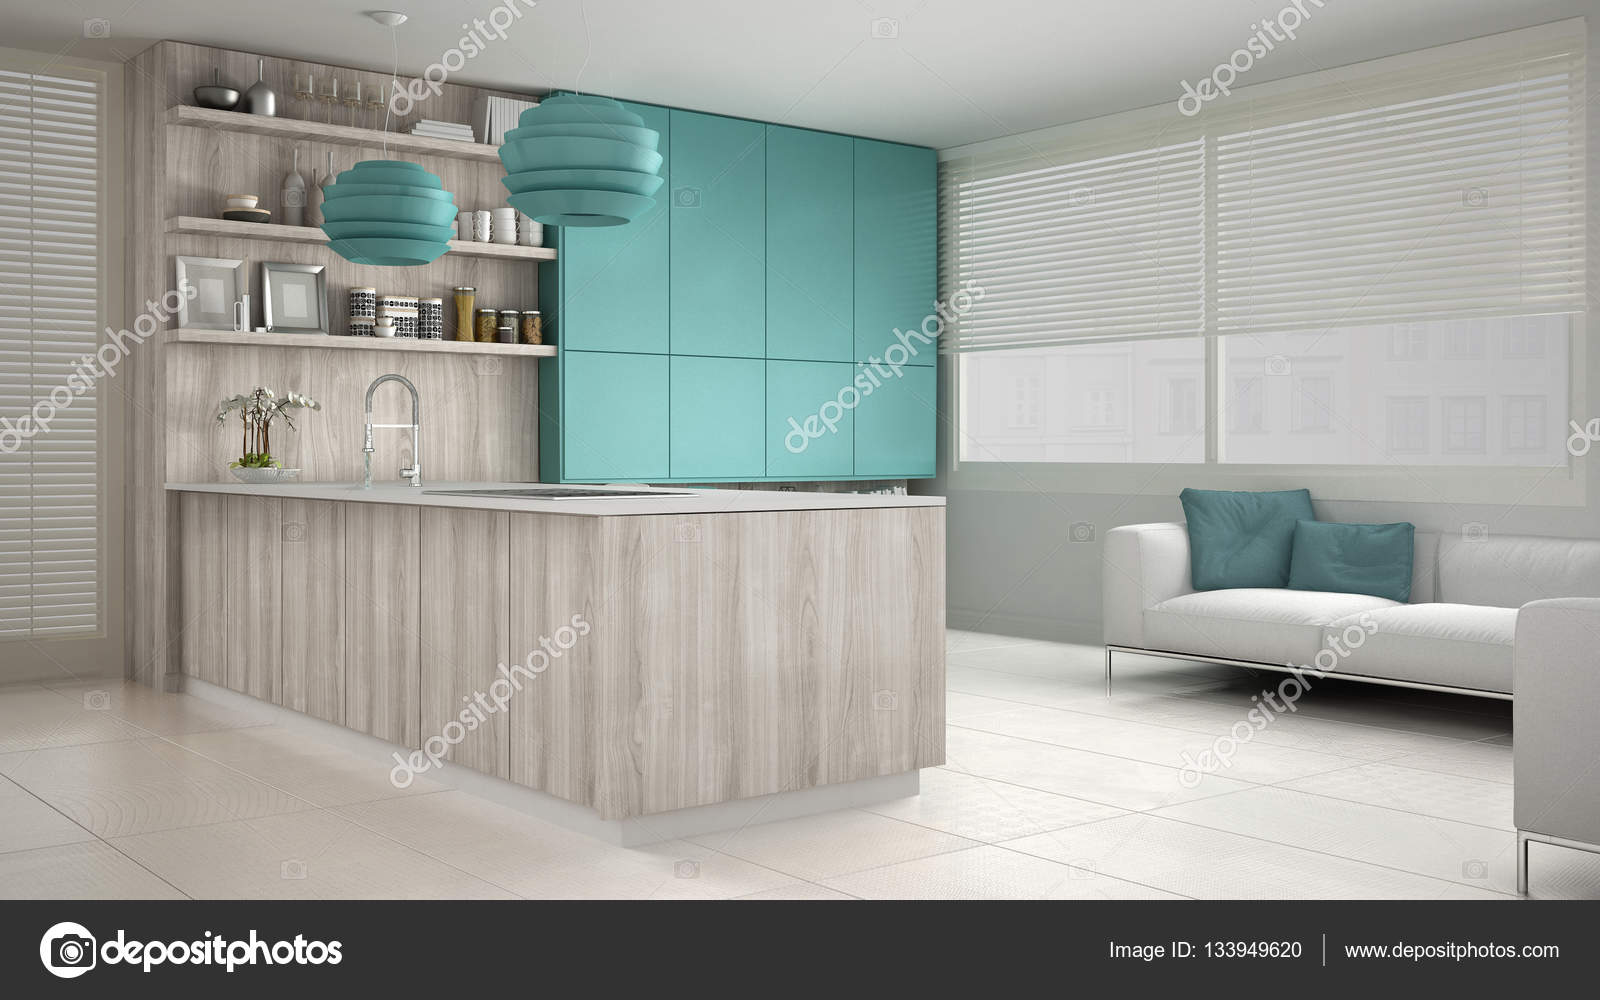 turquoise kitchen decor how to make a cabinet 木制和绿松石的细节 mi 简约白色的厨房 图库照片 c archiviz 133949620